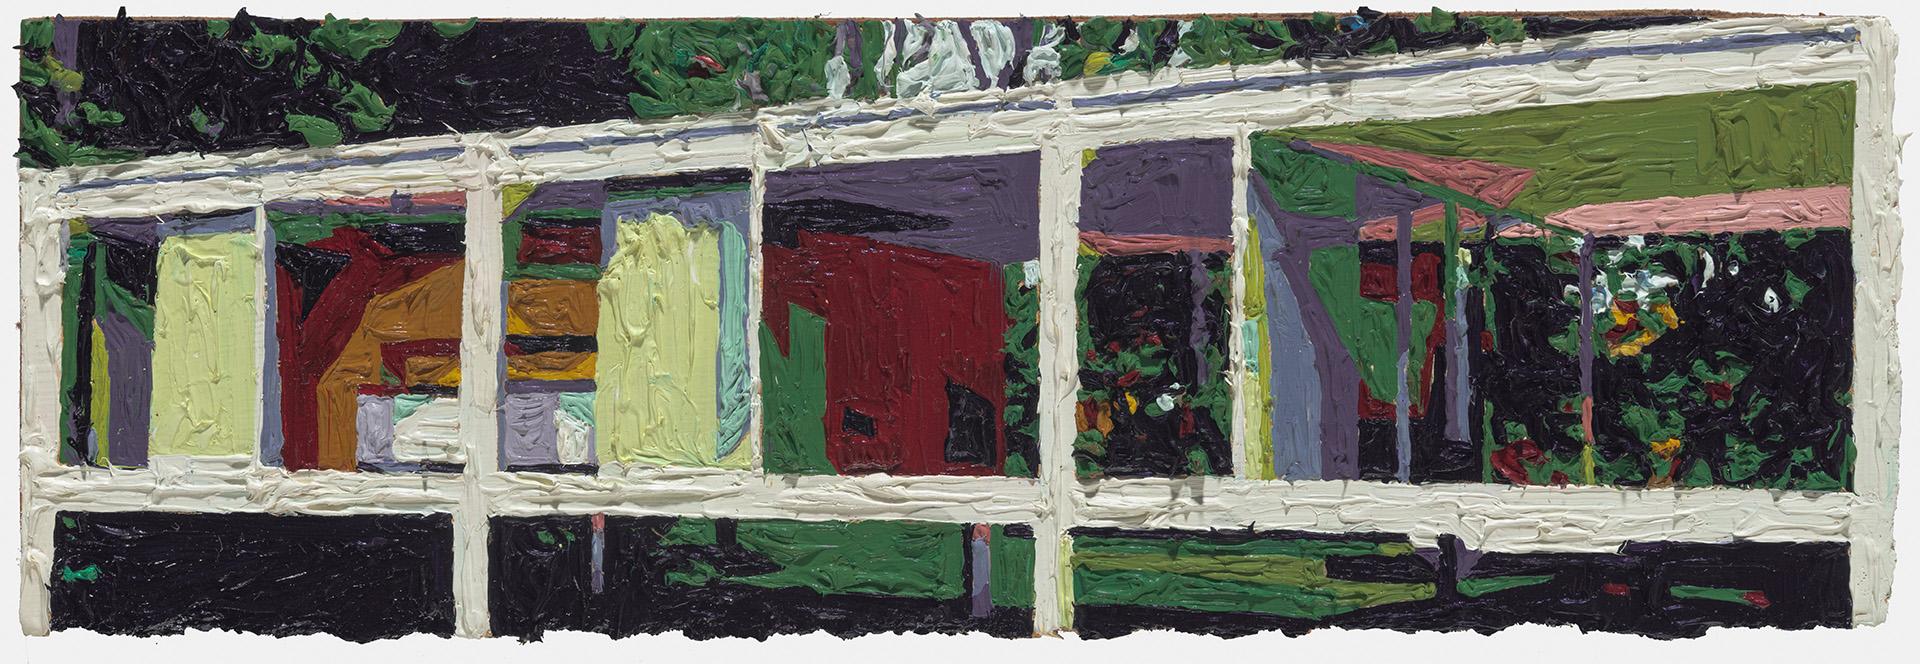 john Ferry - Paintings - Apr 2019-1258.jpg